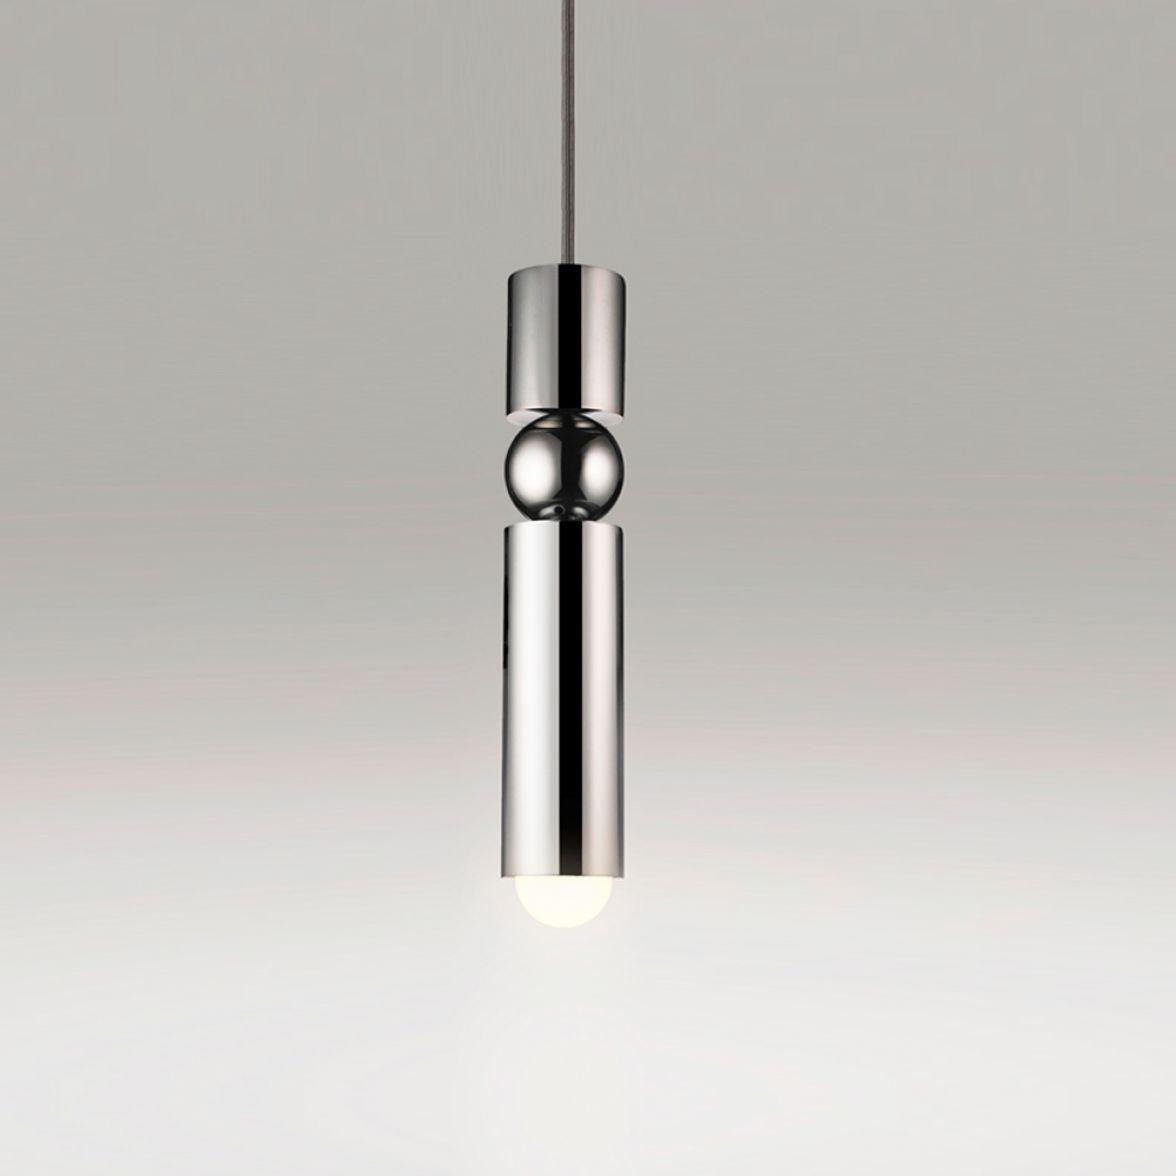 Fulcrum light pendant фото цена